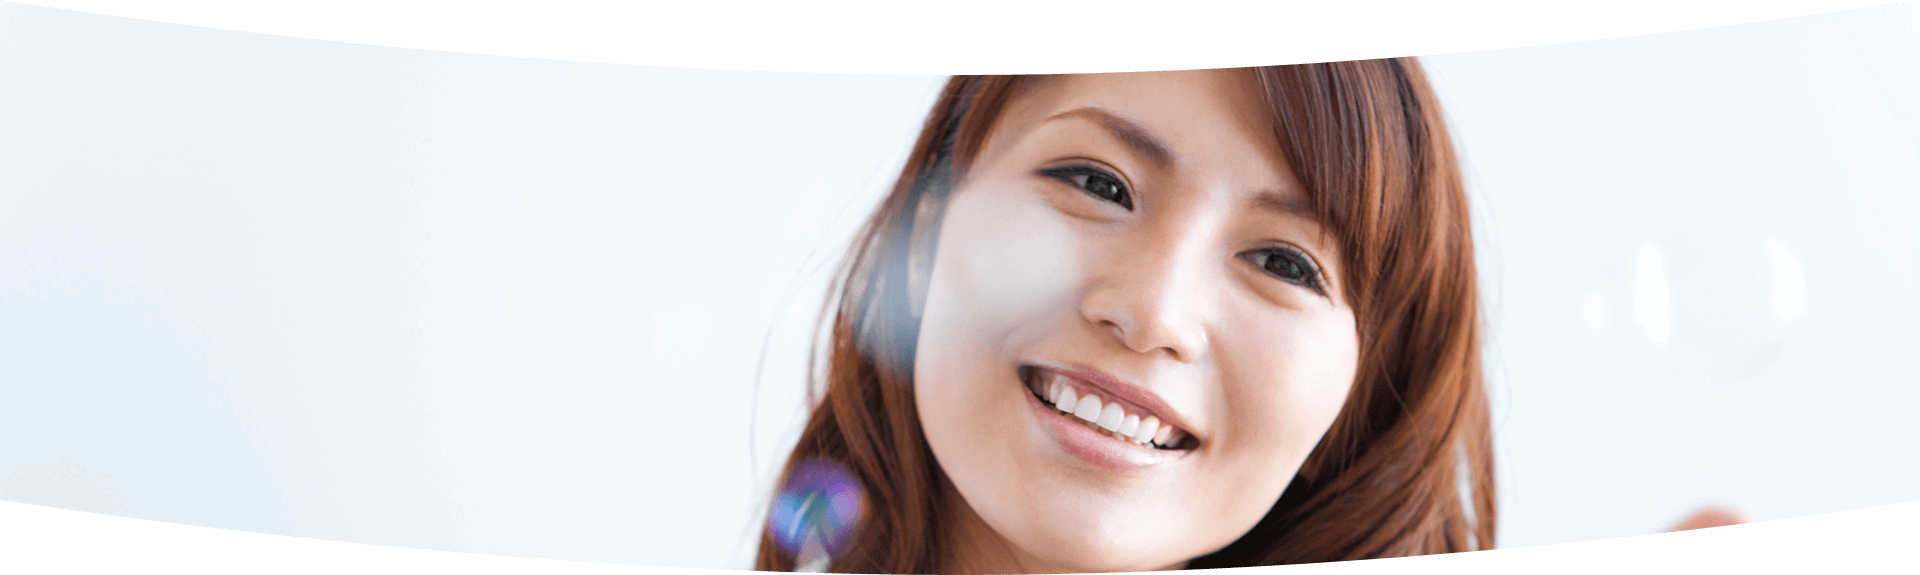 Dentist Calgary - Happy lady 2